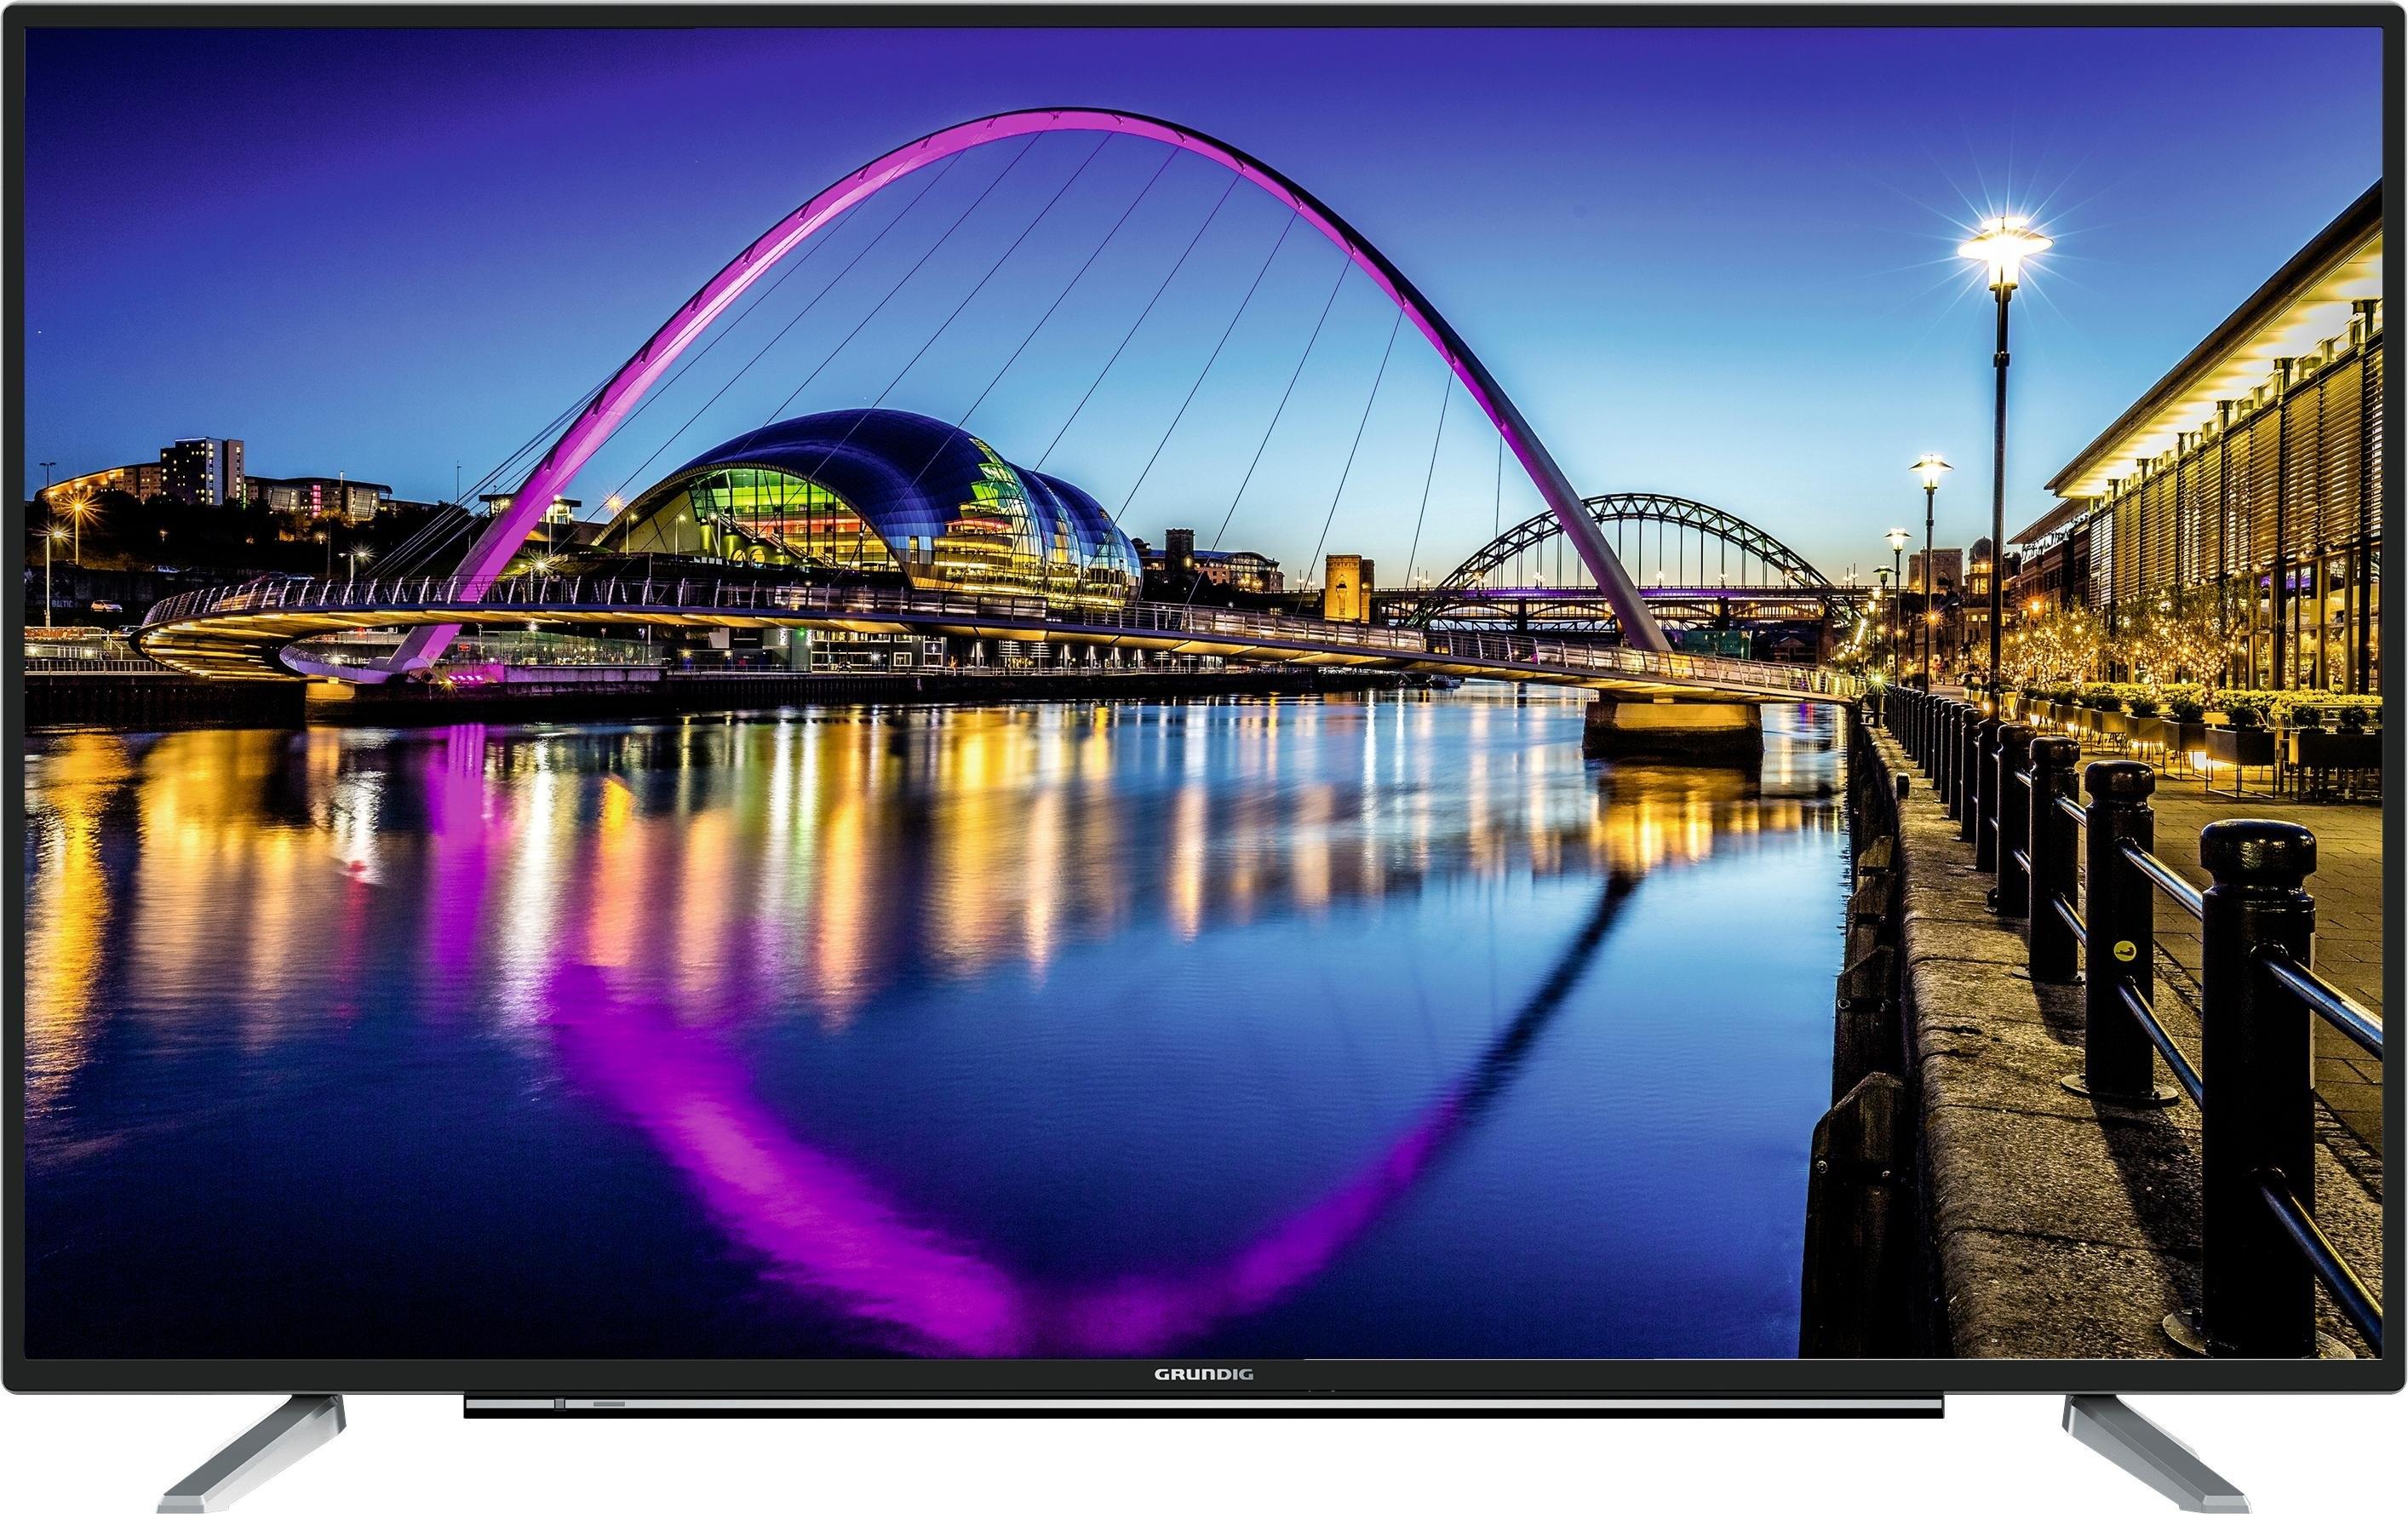 Grundig 32 GFB 6820 led-tv (32 inch), Full HD, smart-tv nu online bestellen